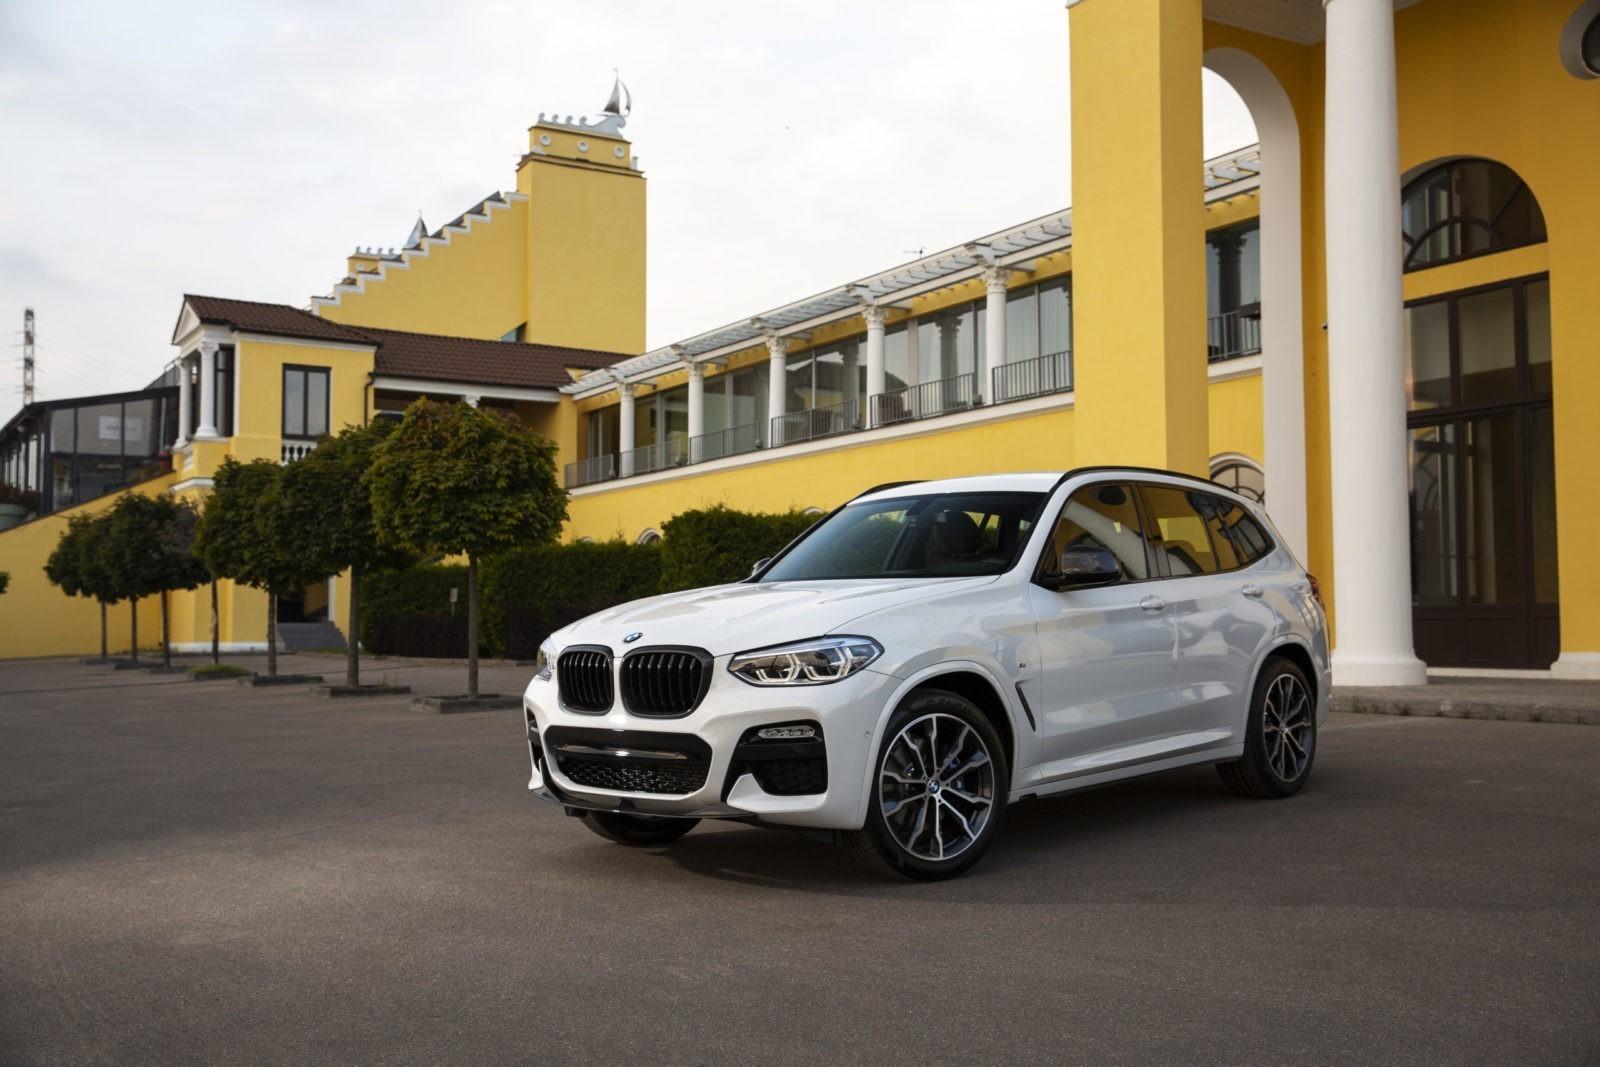 Larte Design body kit for BMW X3 (G01)